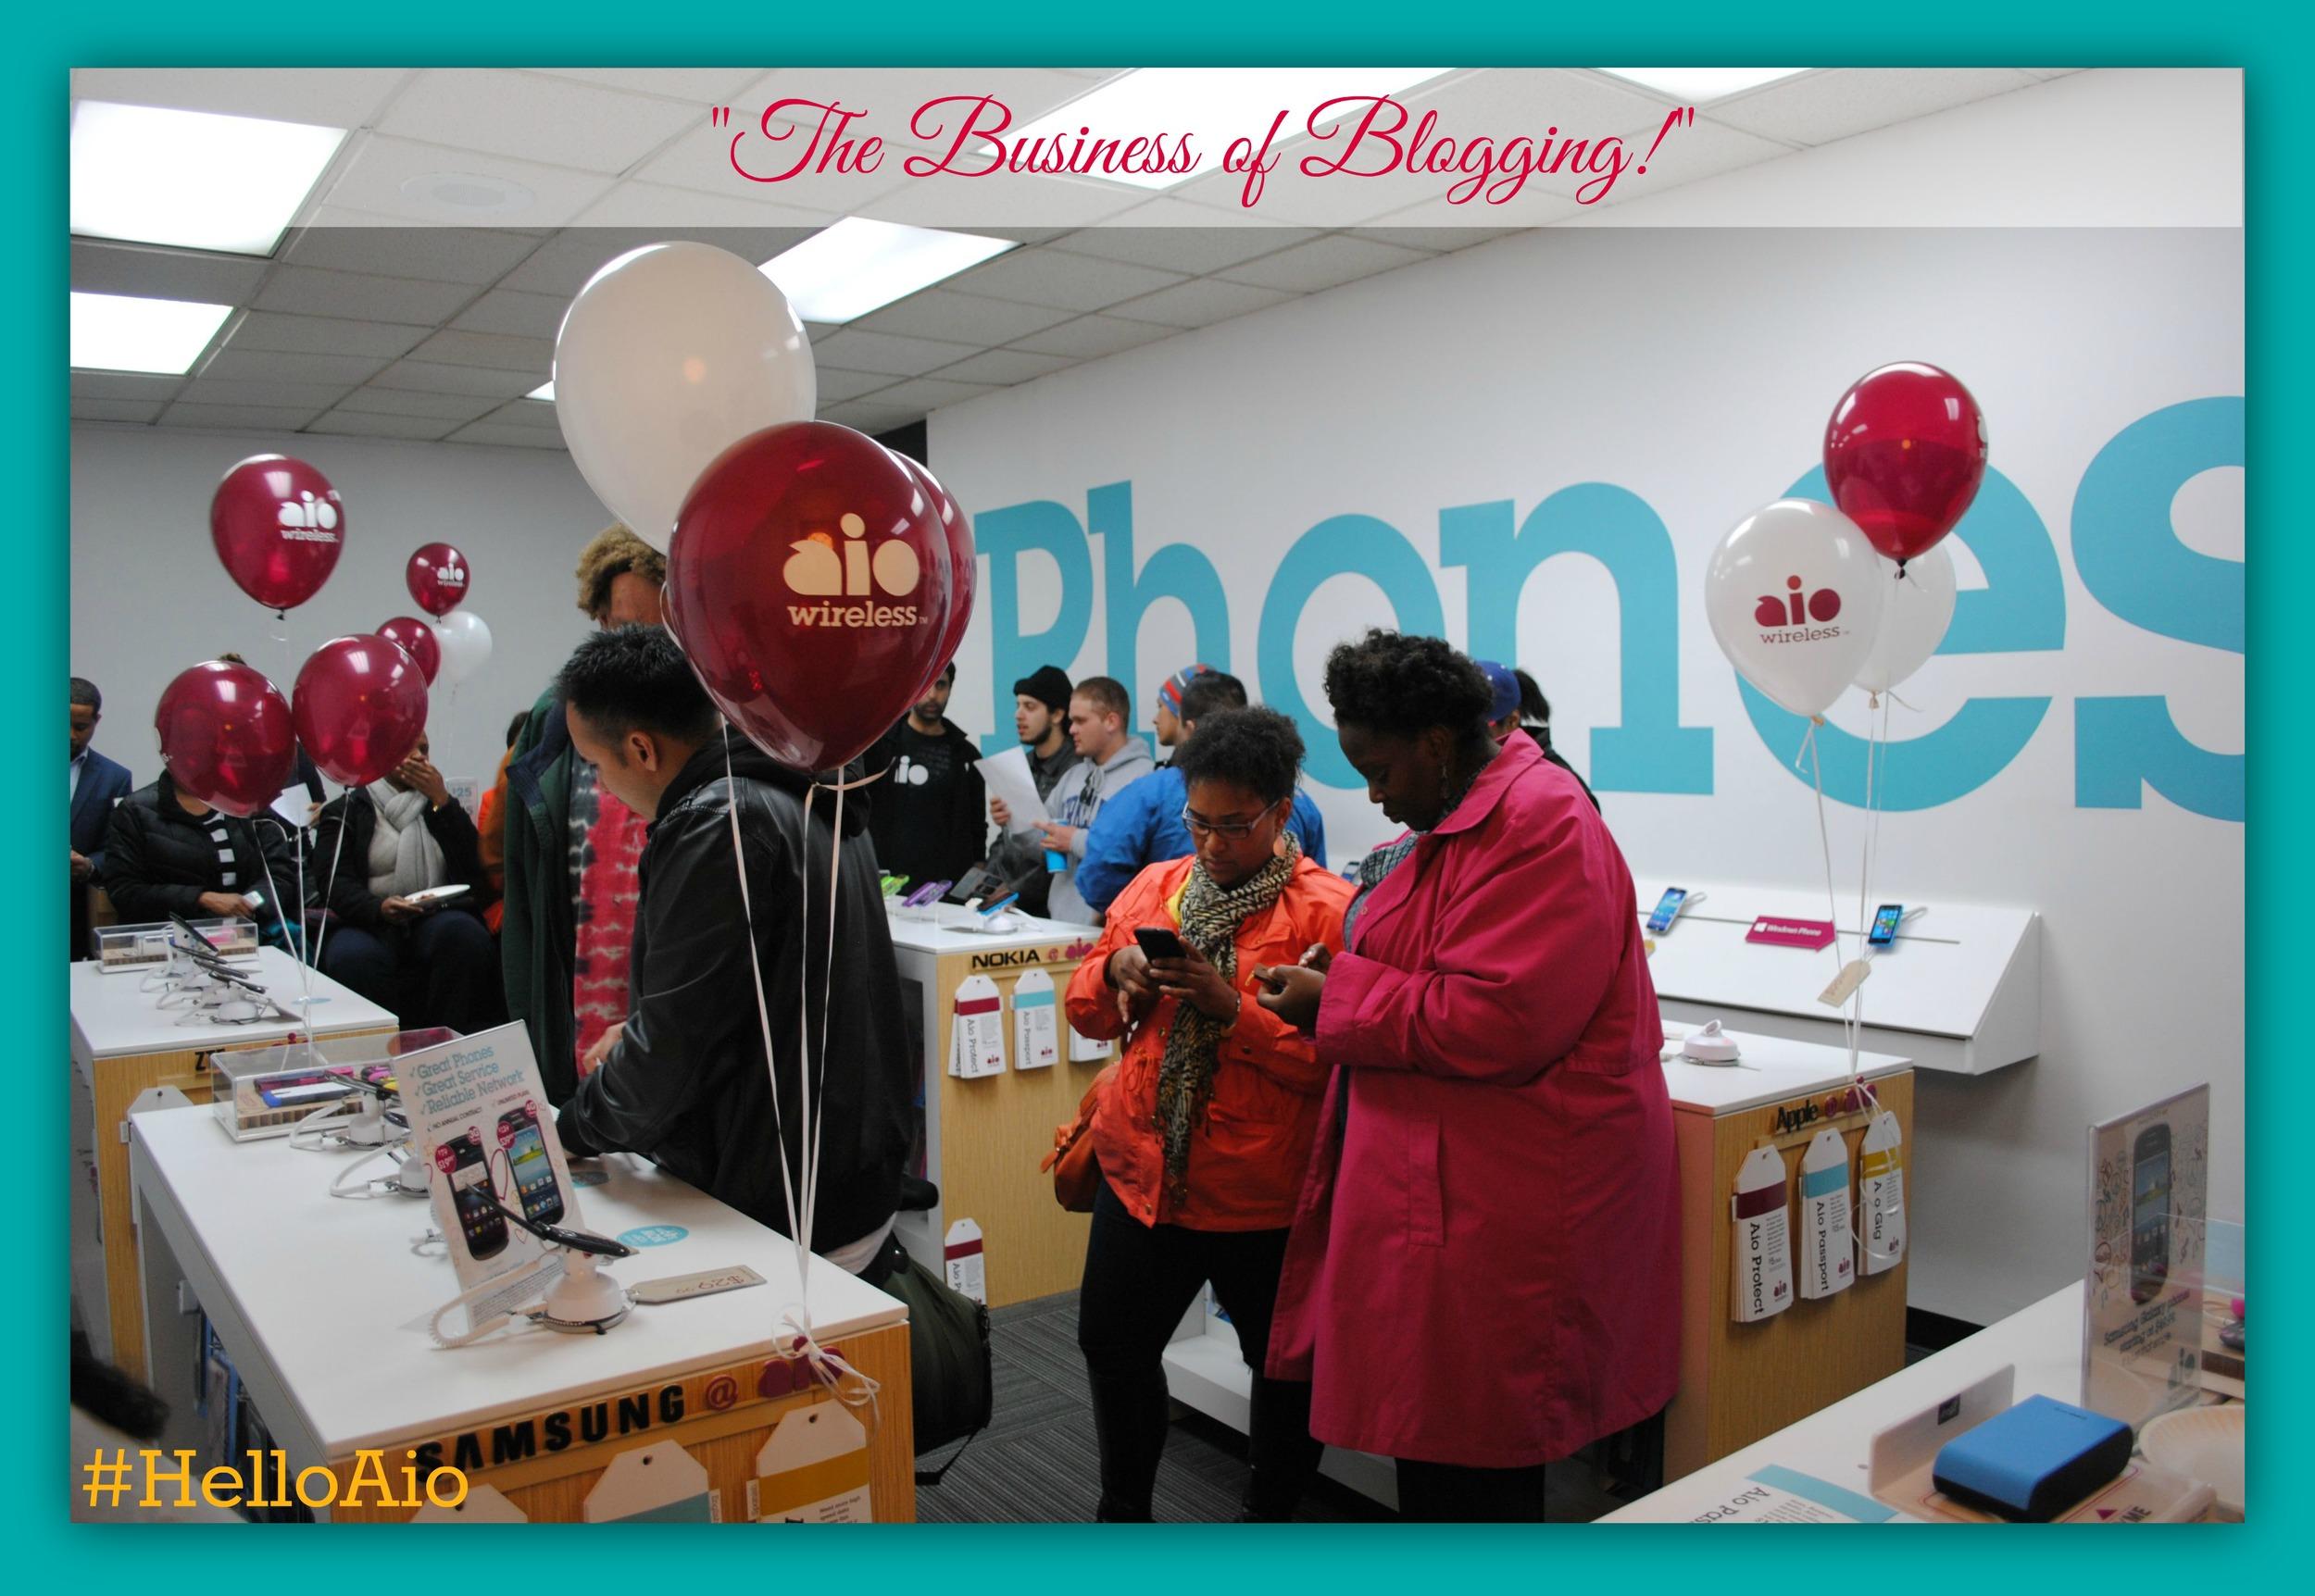 Group #sponsored Business of Blogging ClassyBlackGirl